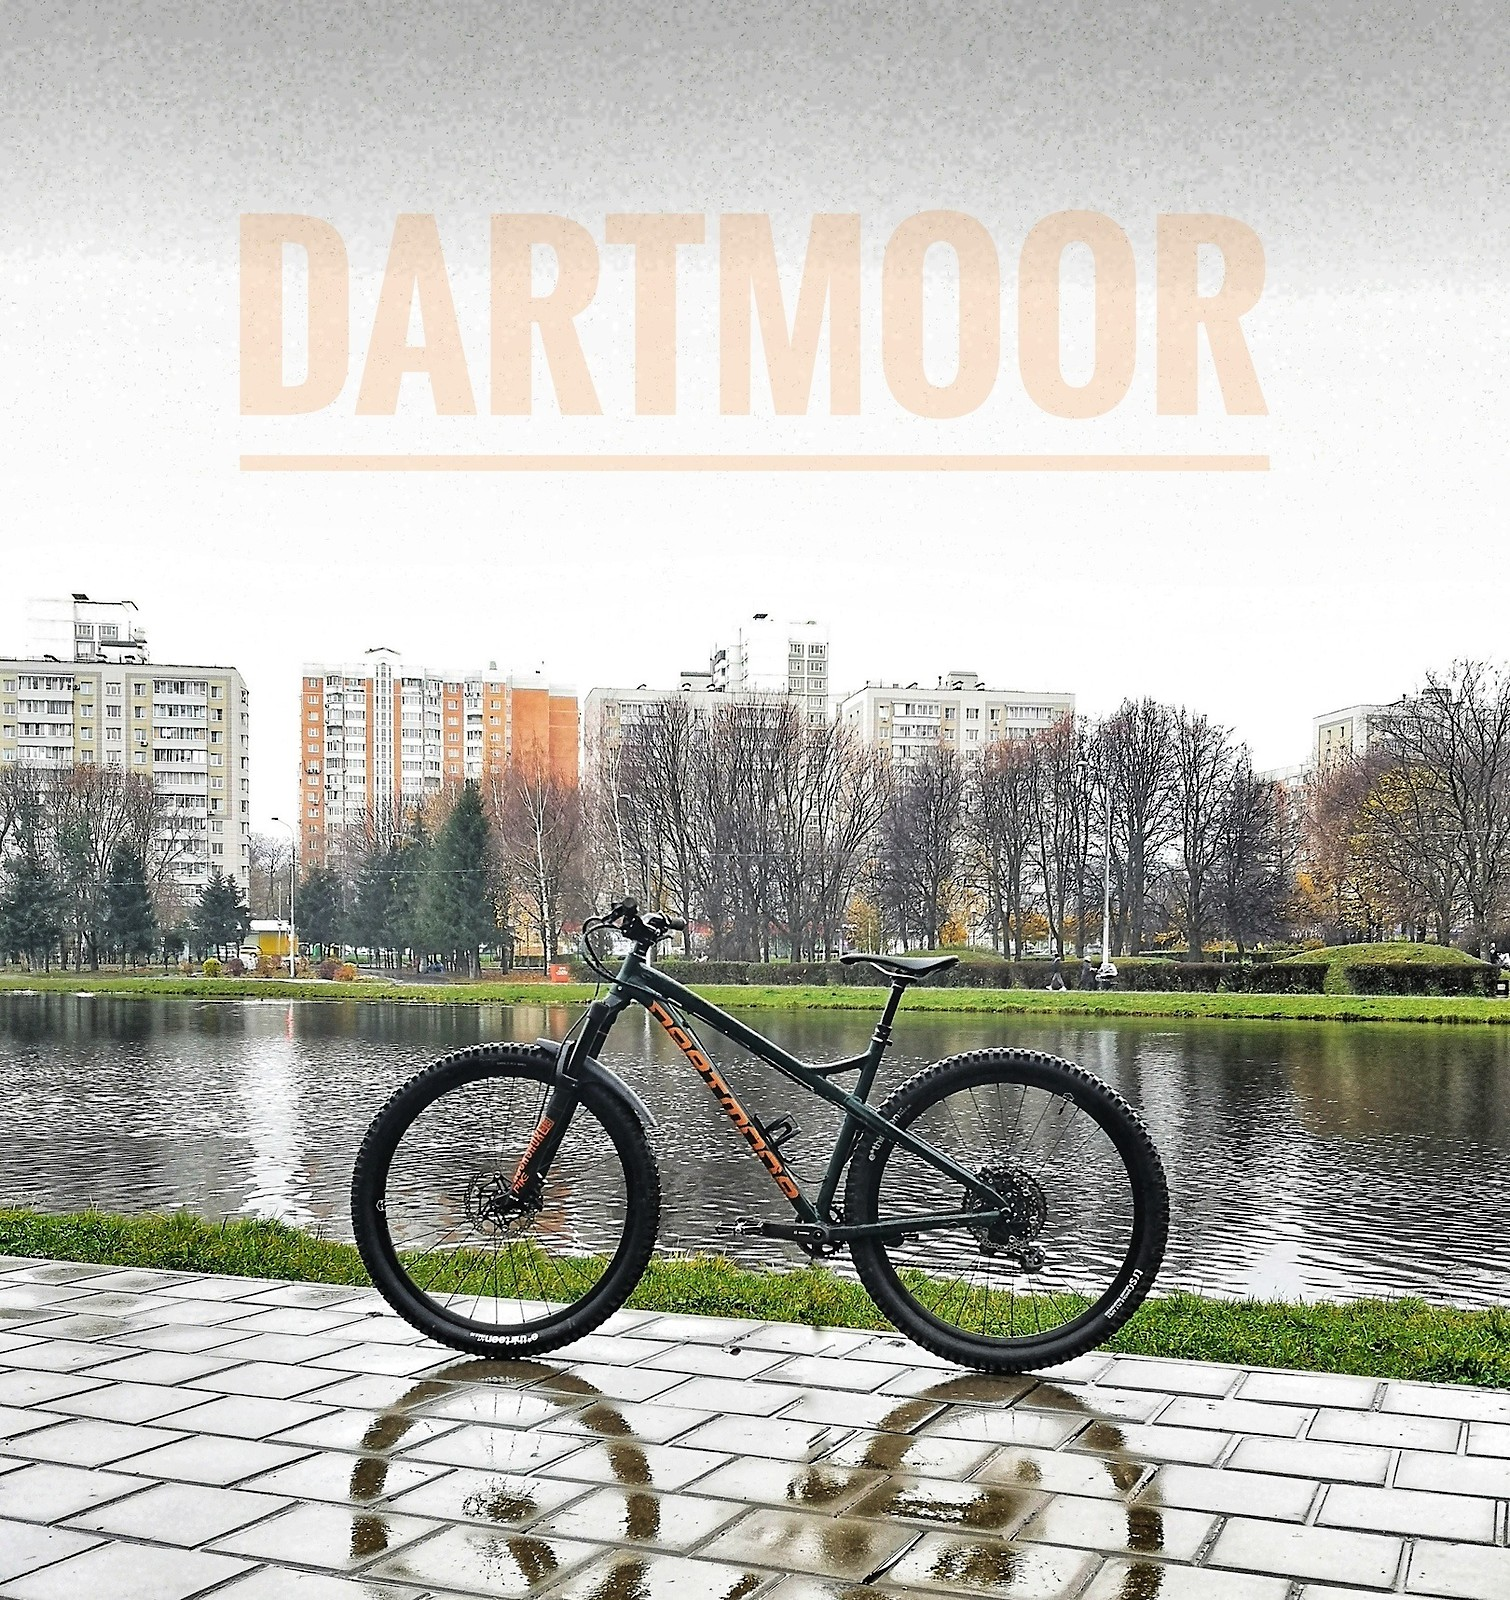 Dartmoor Primal 29